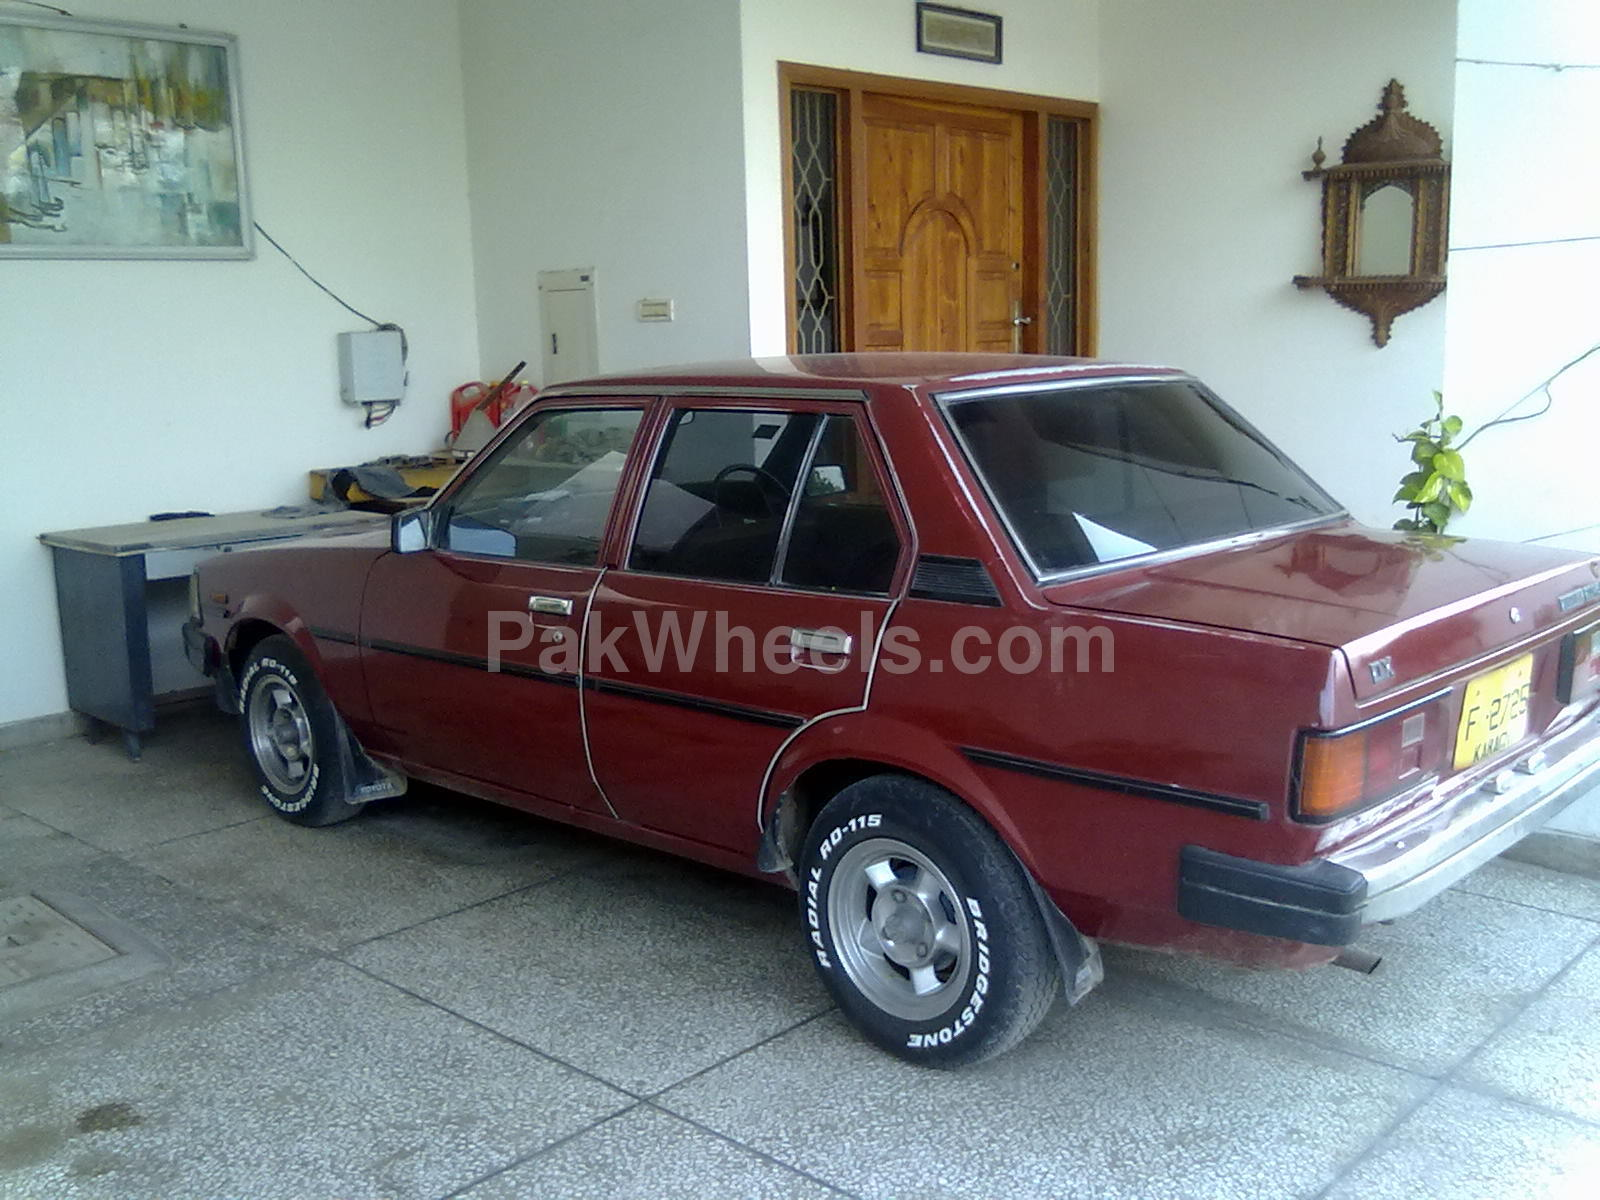 Toyota Corolla - 1982 JybZz Image-1